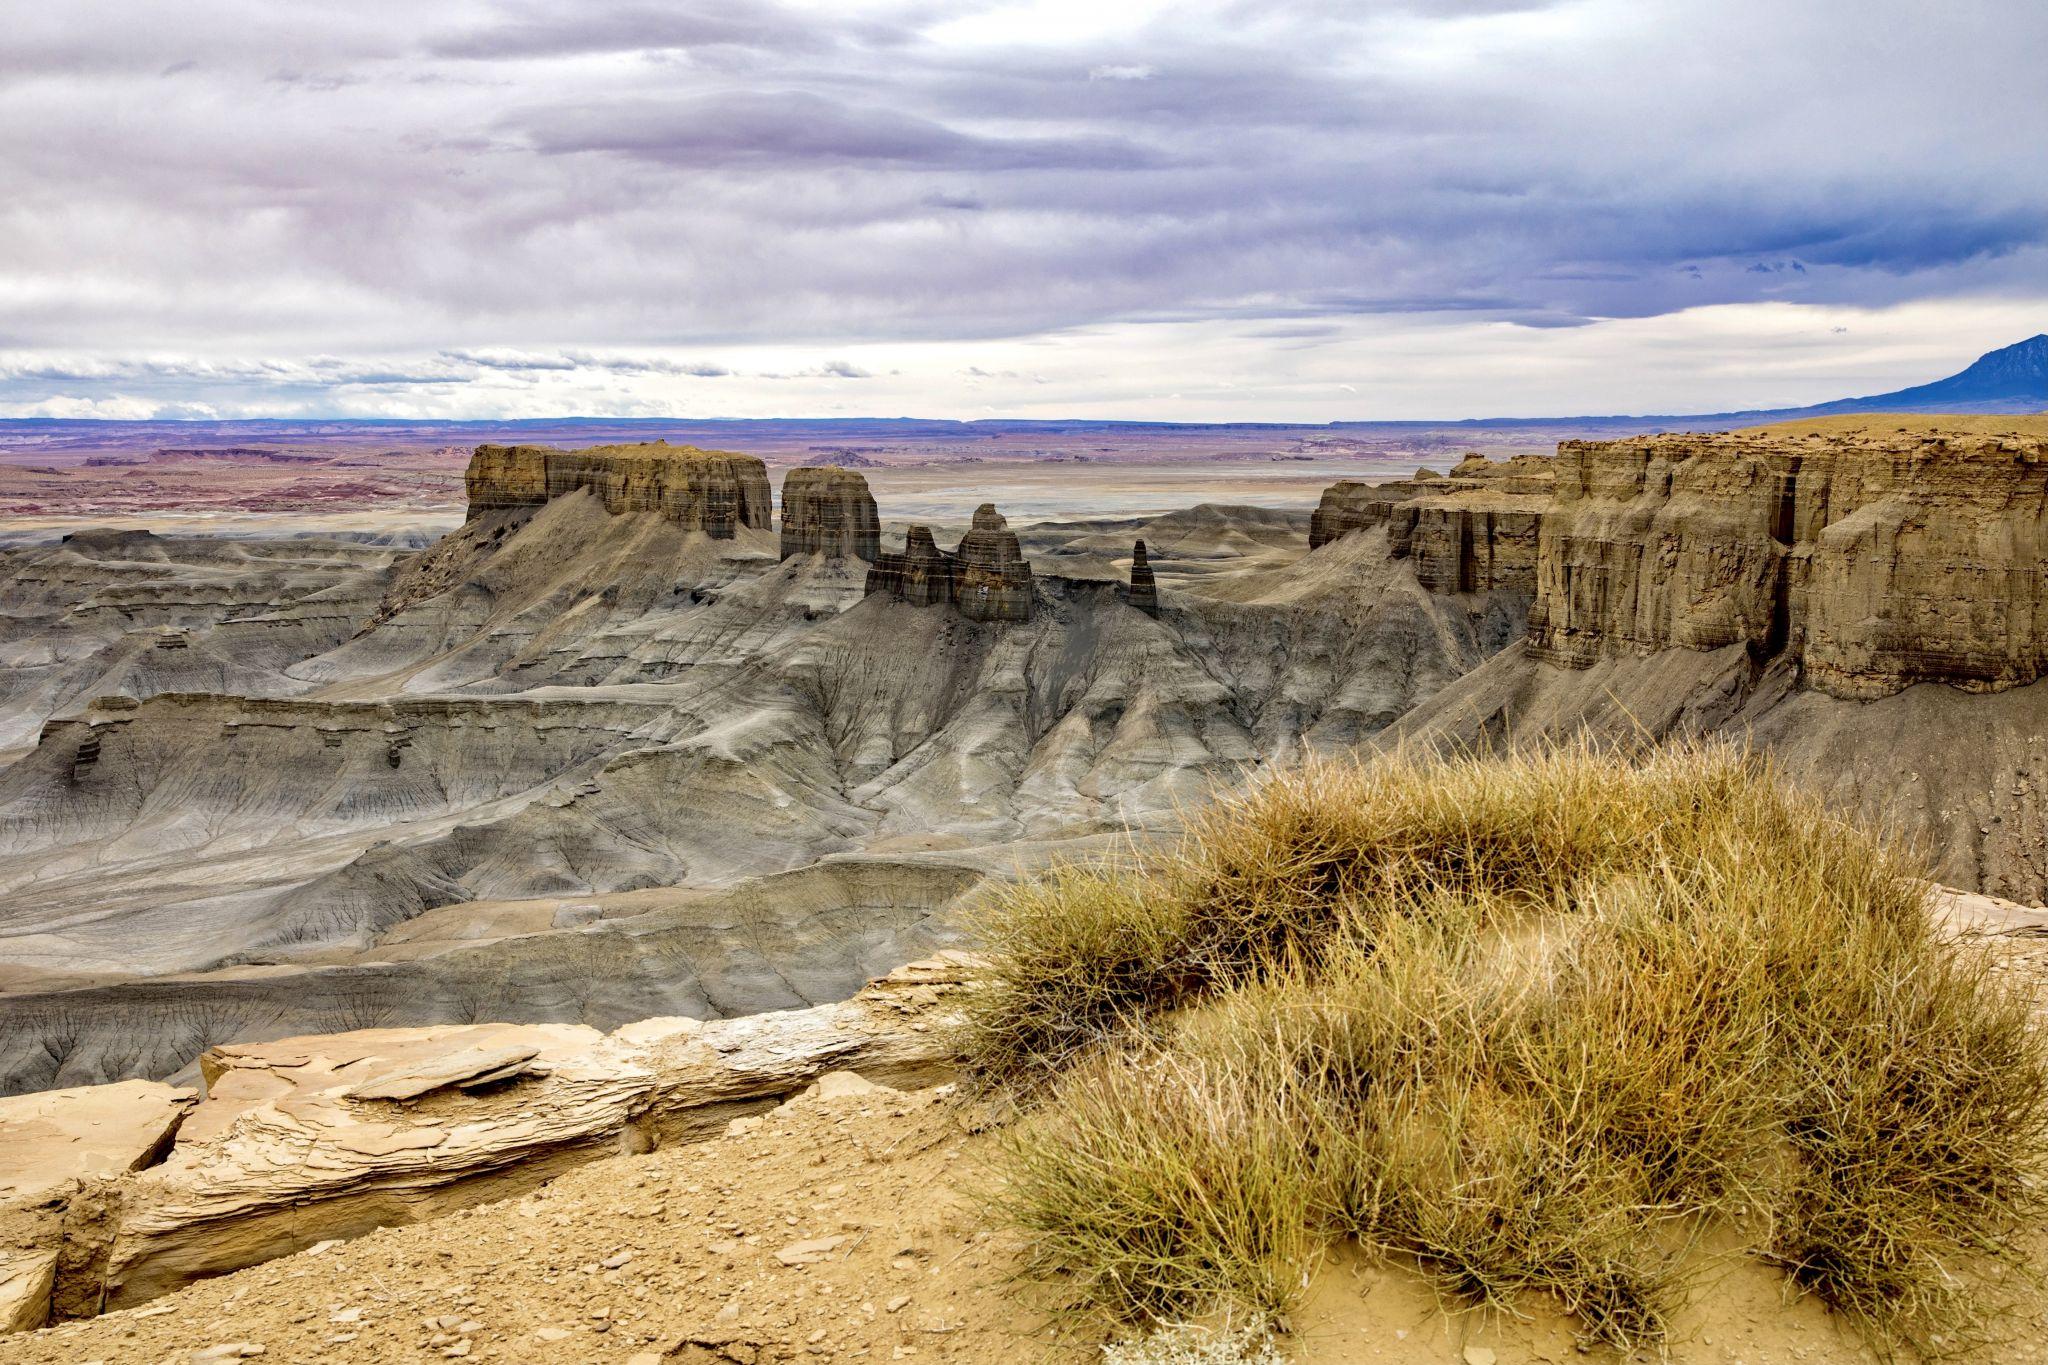 Neo Mars Overlook, USA